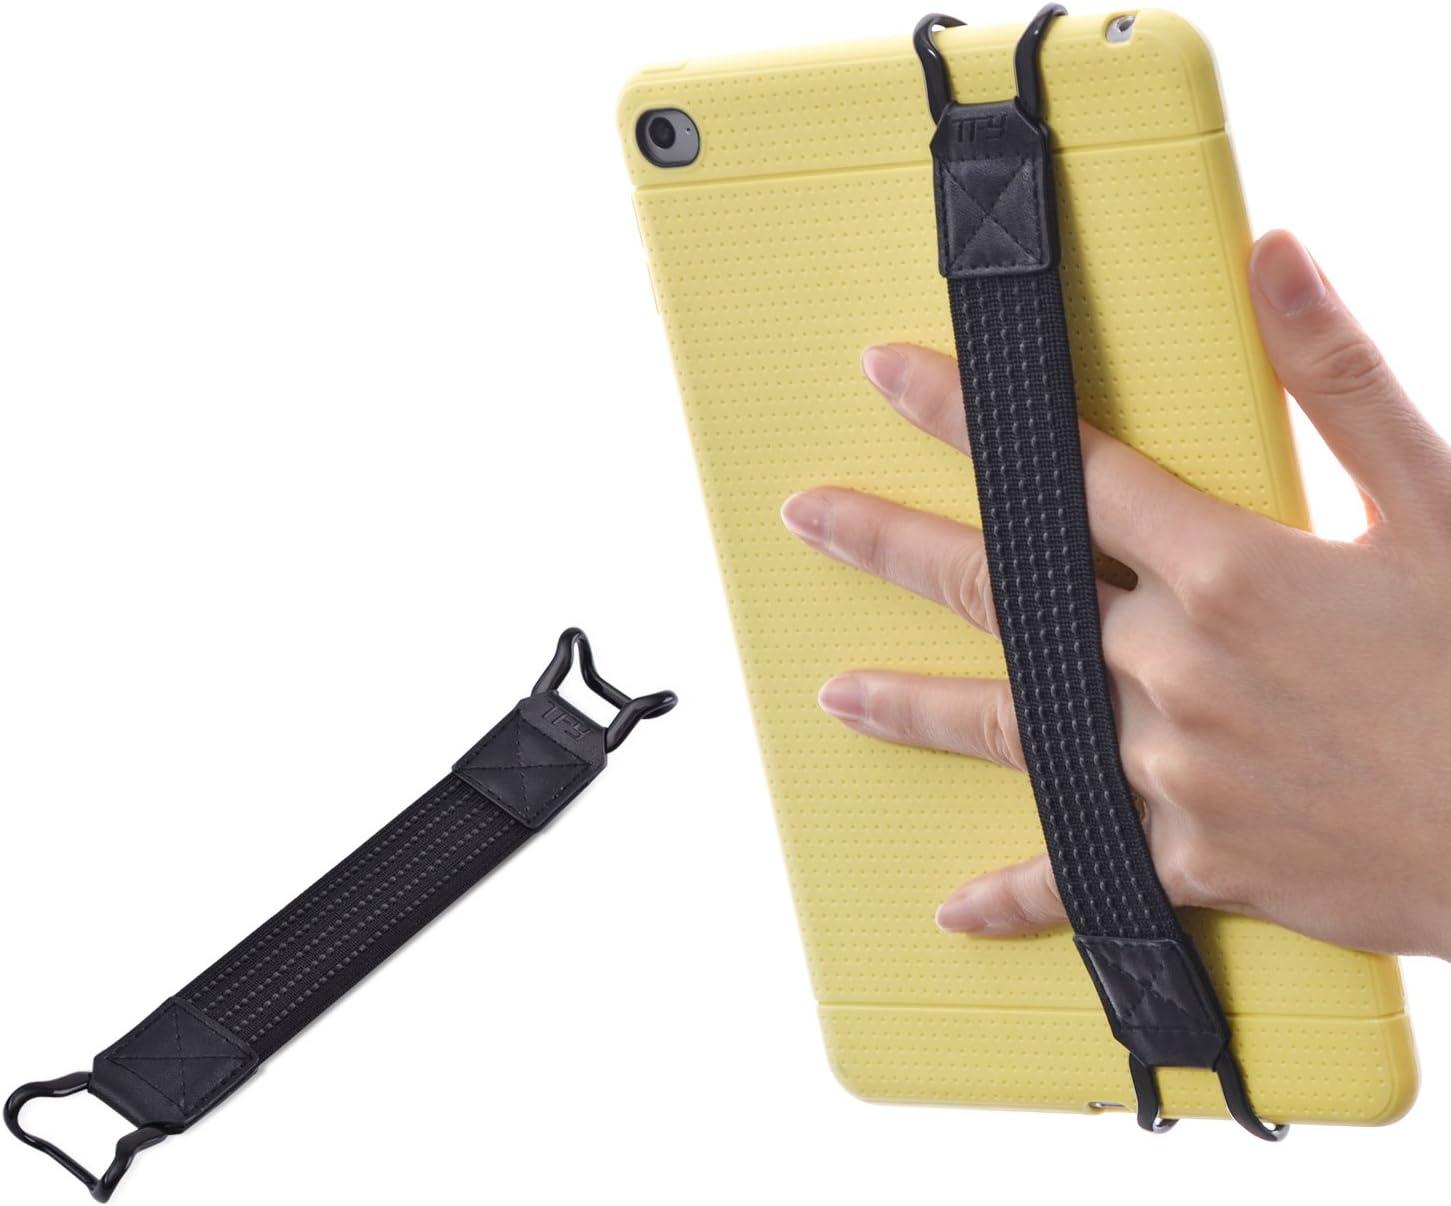 TFY Security Hand-Strap for Tablets -Compatible with iPad (New iPad/iPad Mini & Mini 2 & Mini 3 / iPad Air/iPad Air 2 / iPad Pro 9.7 Inch) - Samsung Tablets - Nexus 7 / Nexus 10 and More